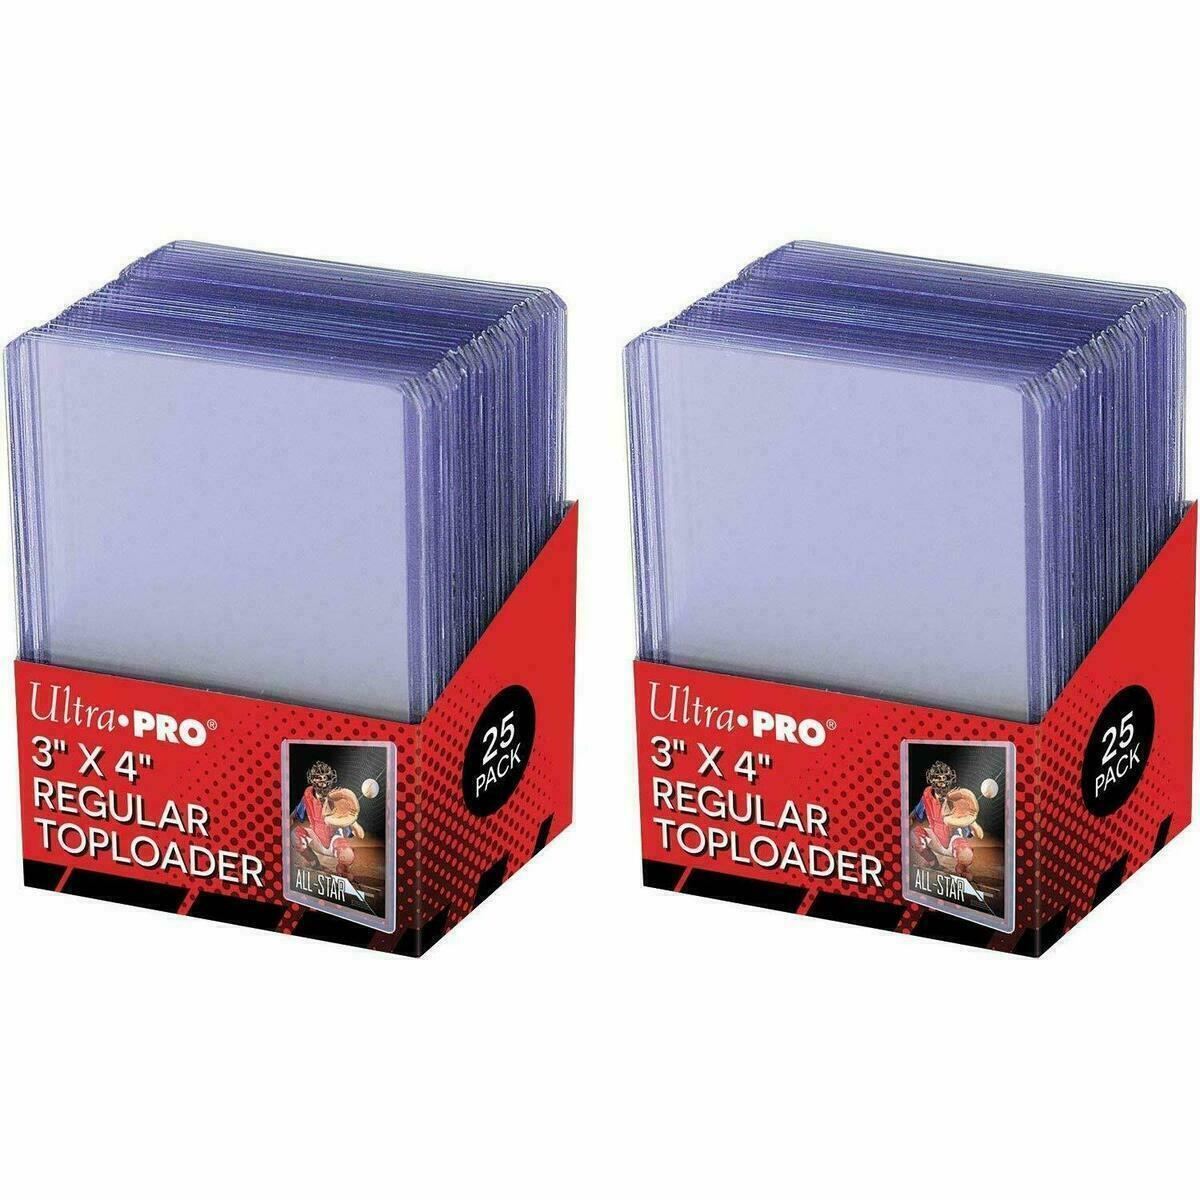 50 BCW Topload Rigid 3X4 Hard Plastic Toploader Storage Holder Trading Cards